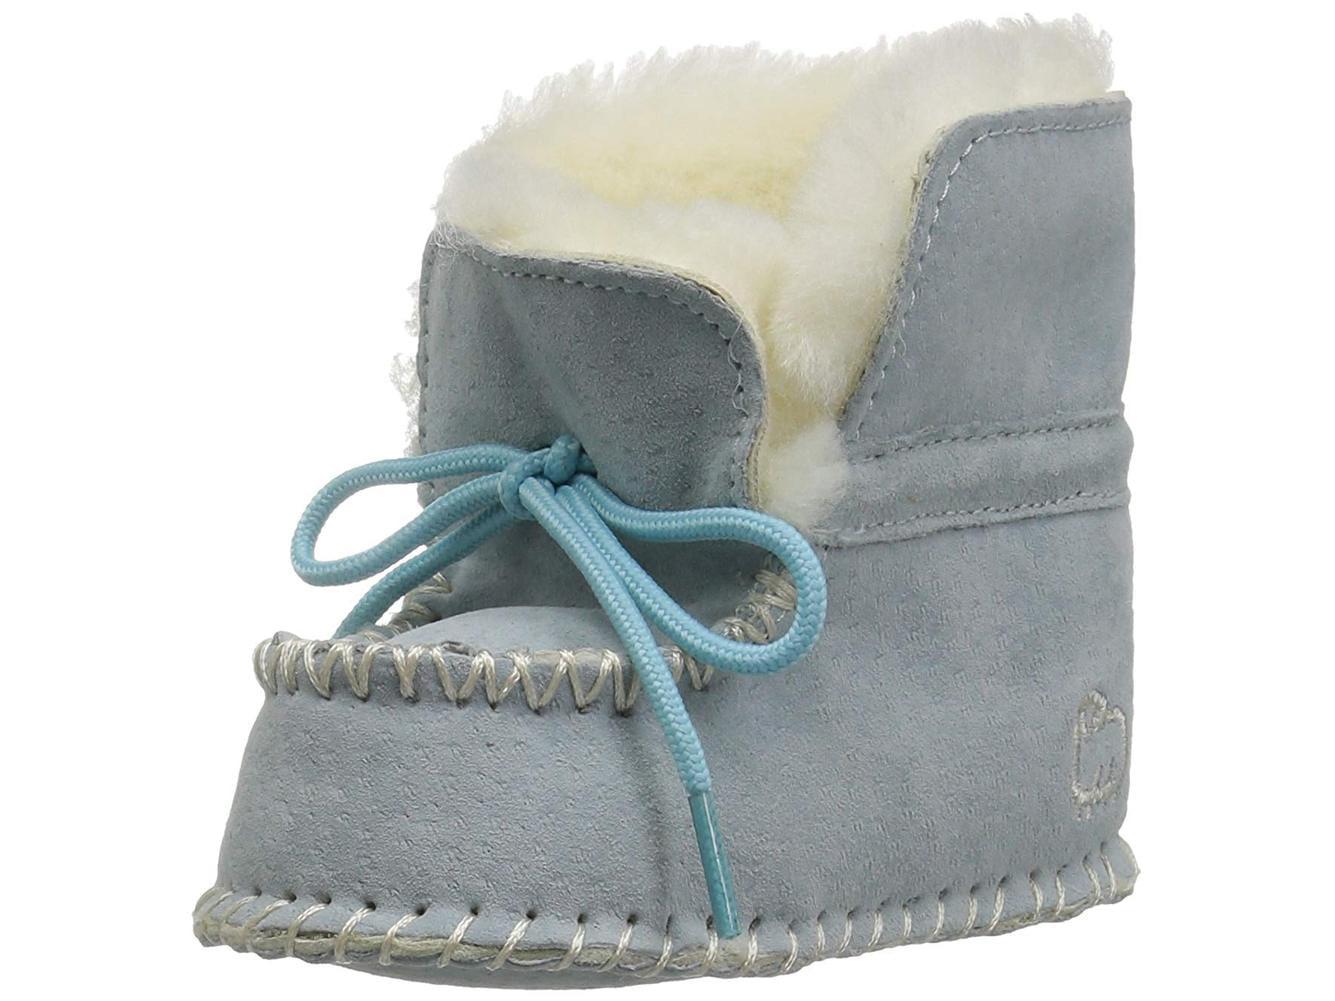 97655b458 Lamo Baby Wool Lined Slip On Moccasin